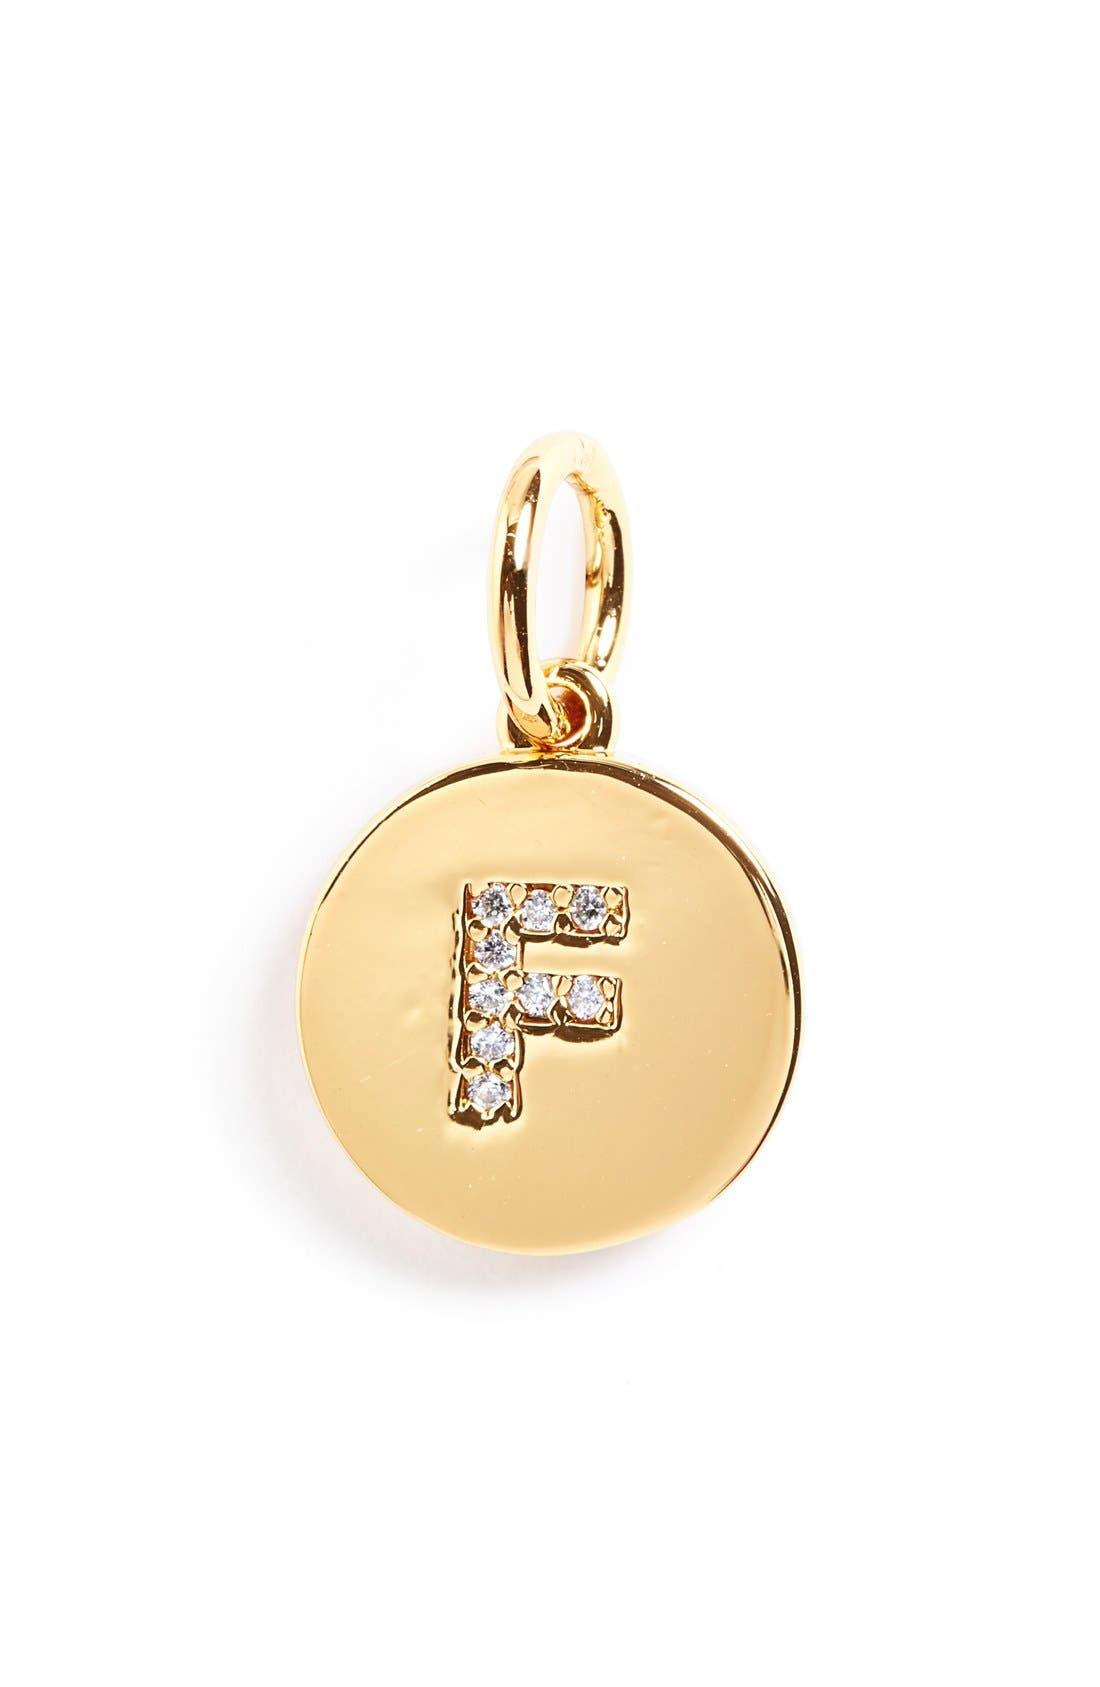 'Ice Alpha' Charm,                         Main,                         color, Gold - F